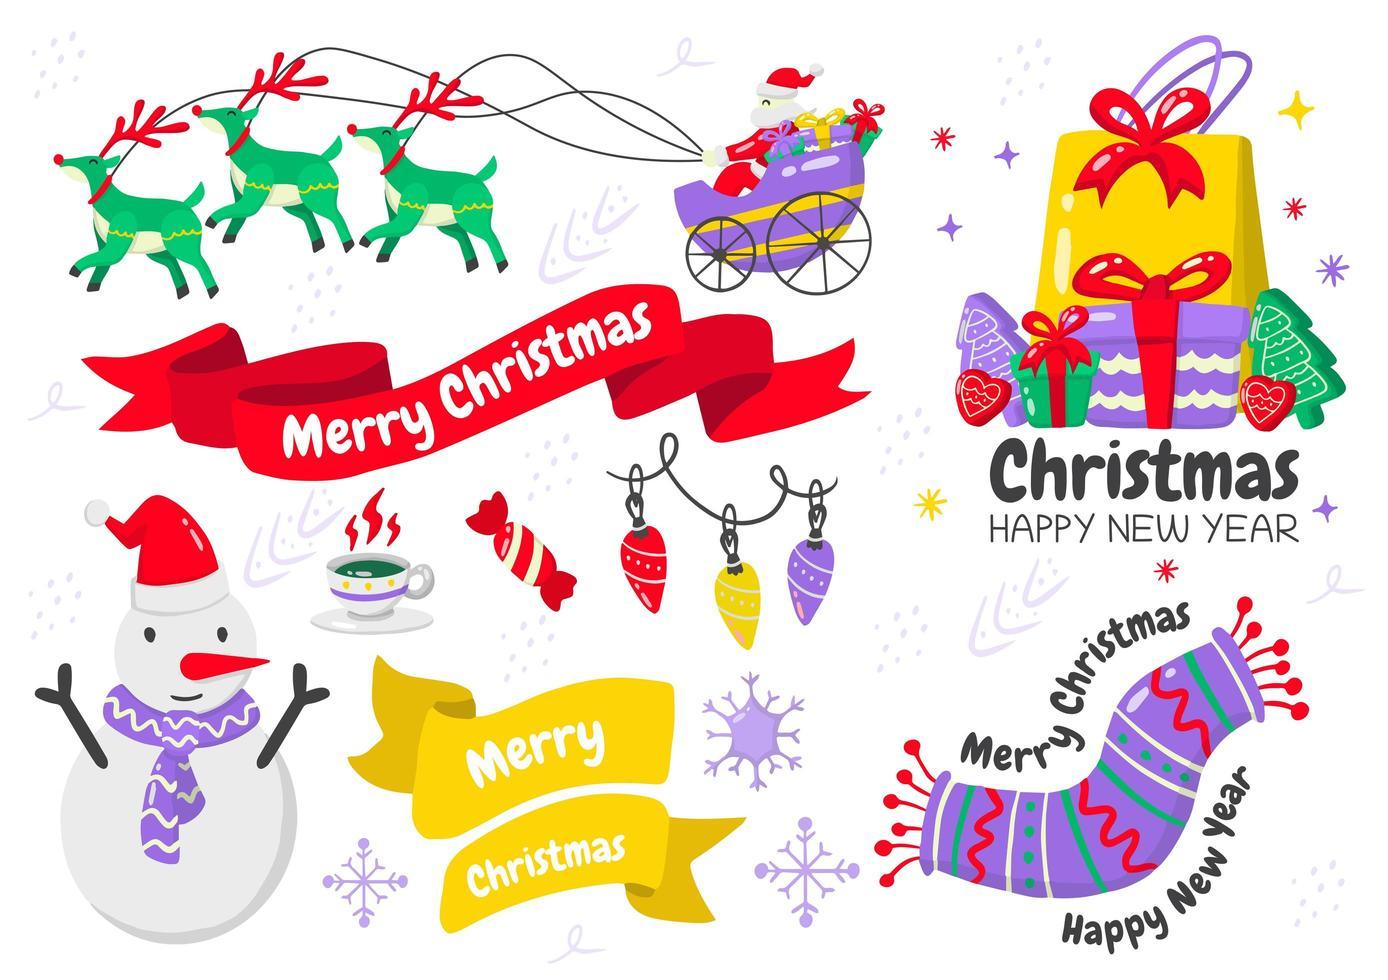 Cartoon style Christmas element and emblem set vector